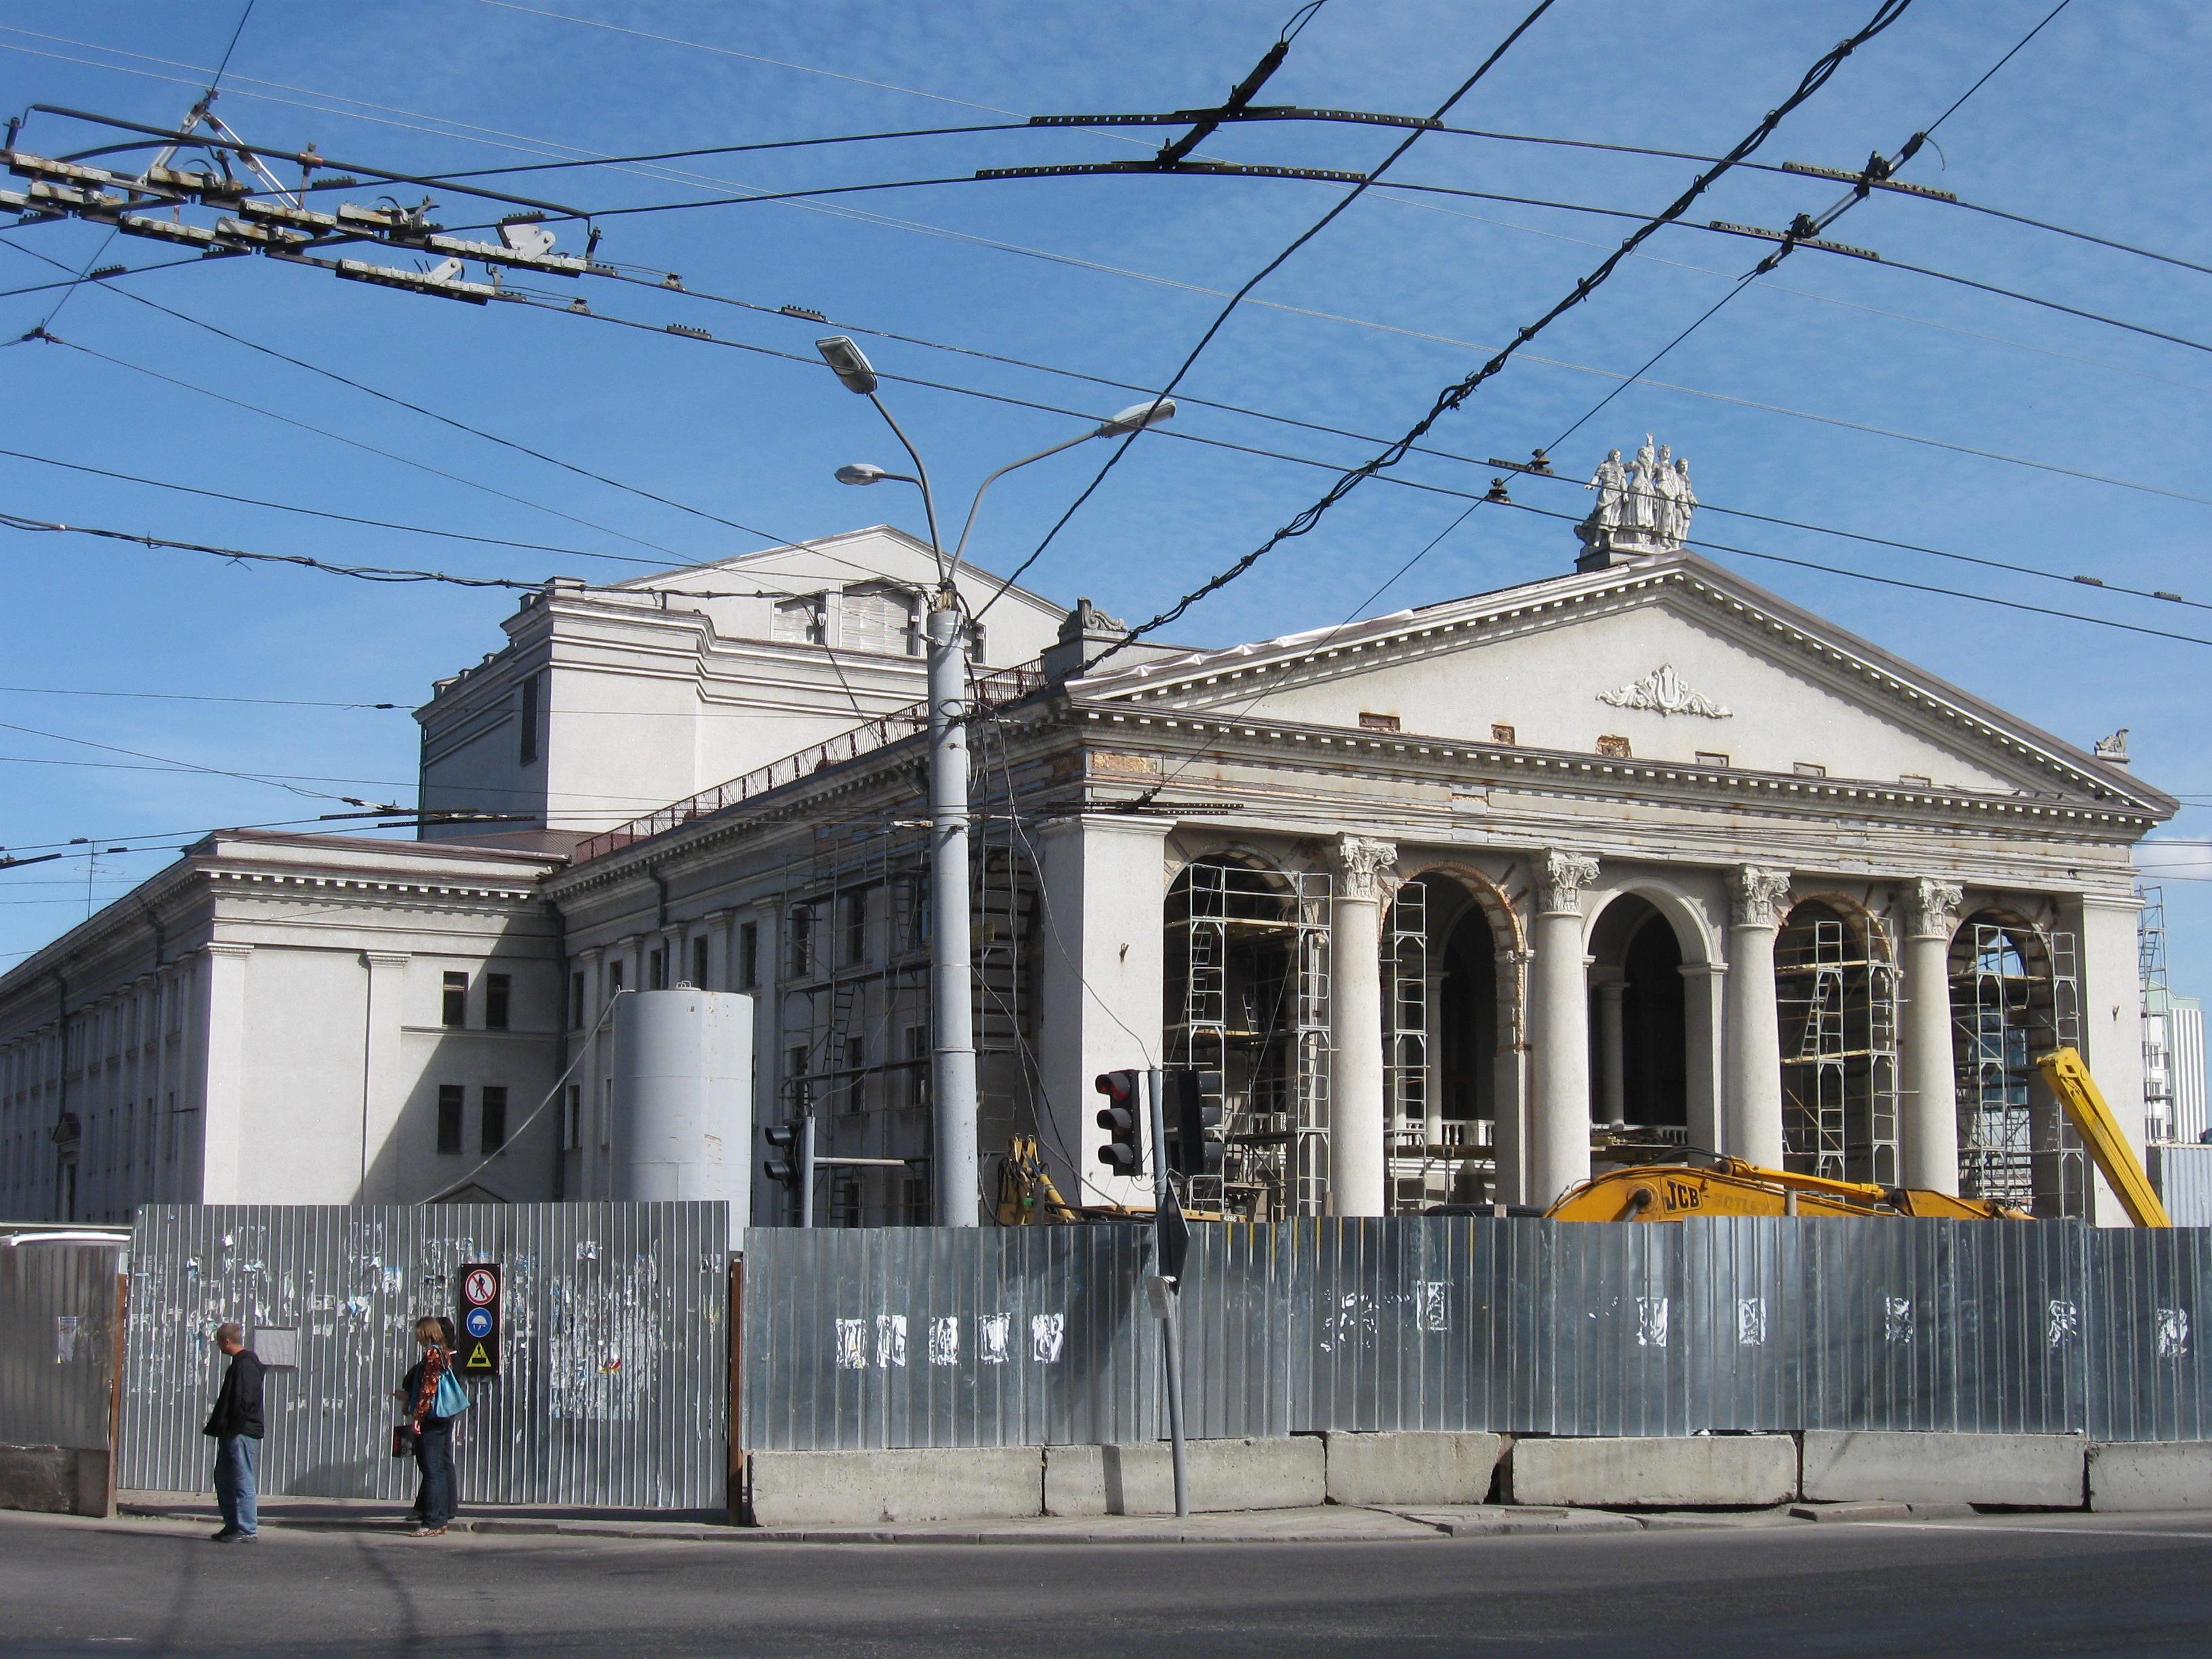 Театр ровно афиша как пройти на концерт в олимпийском без билета